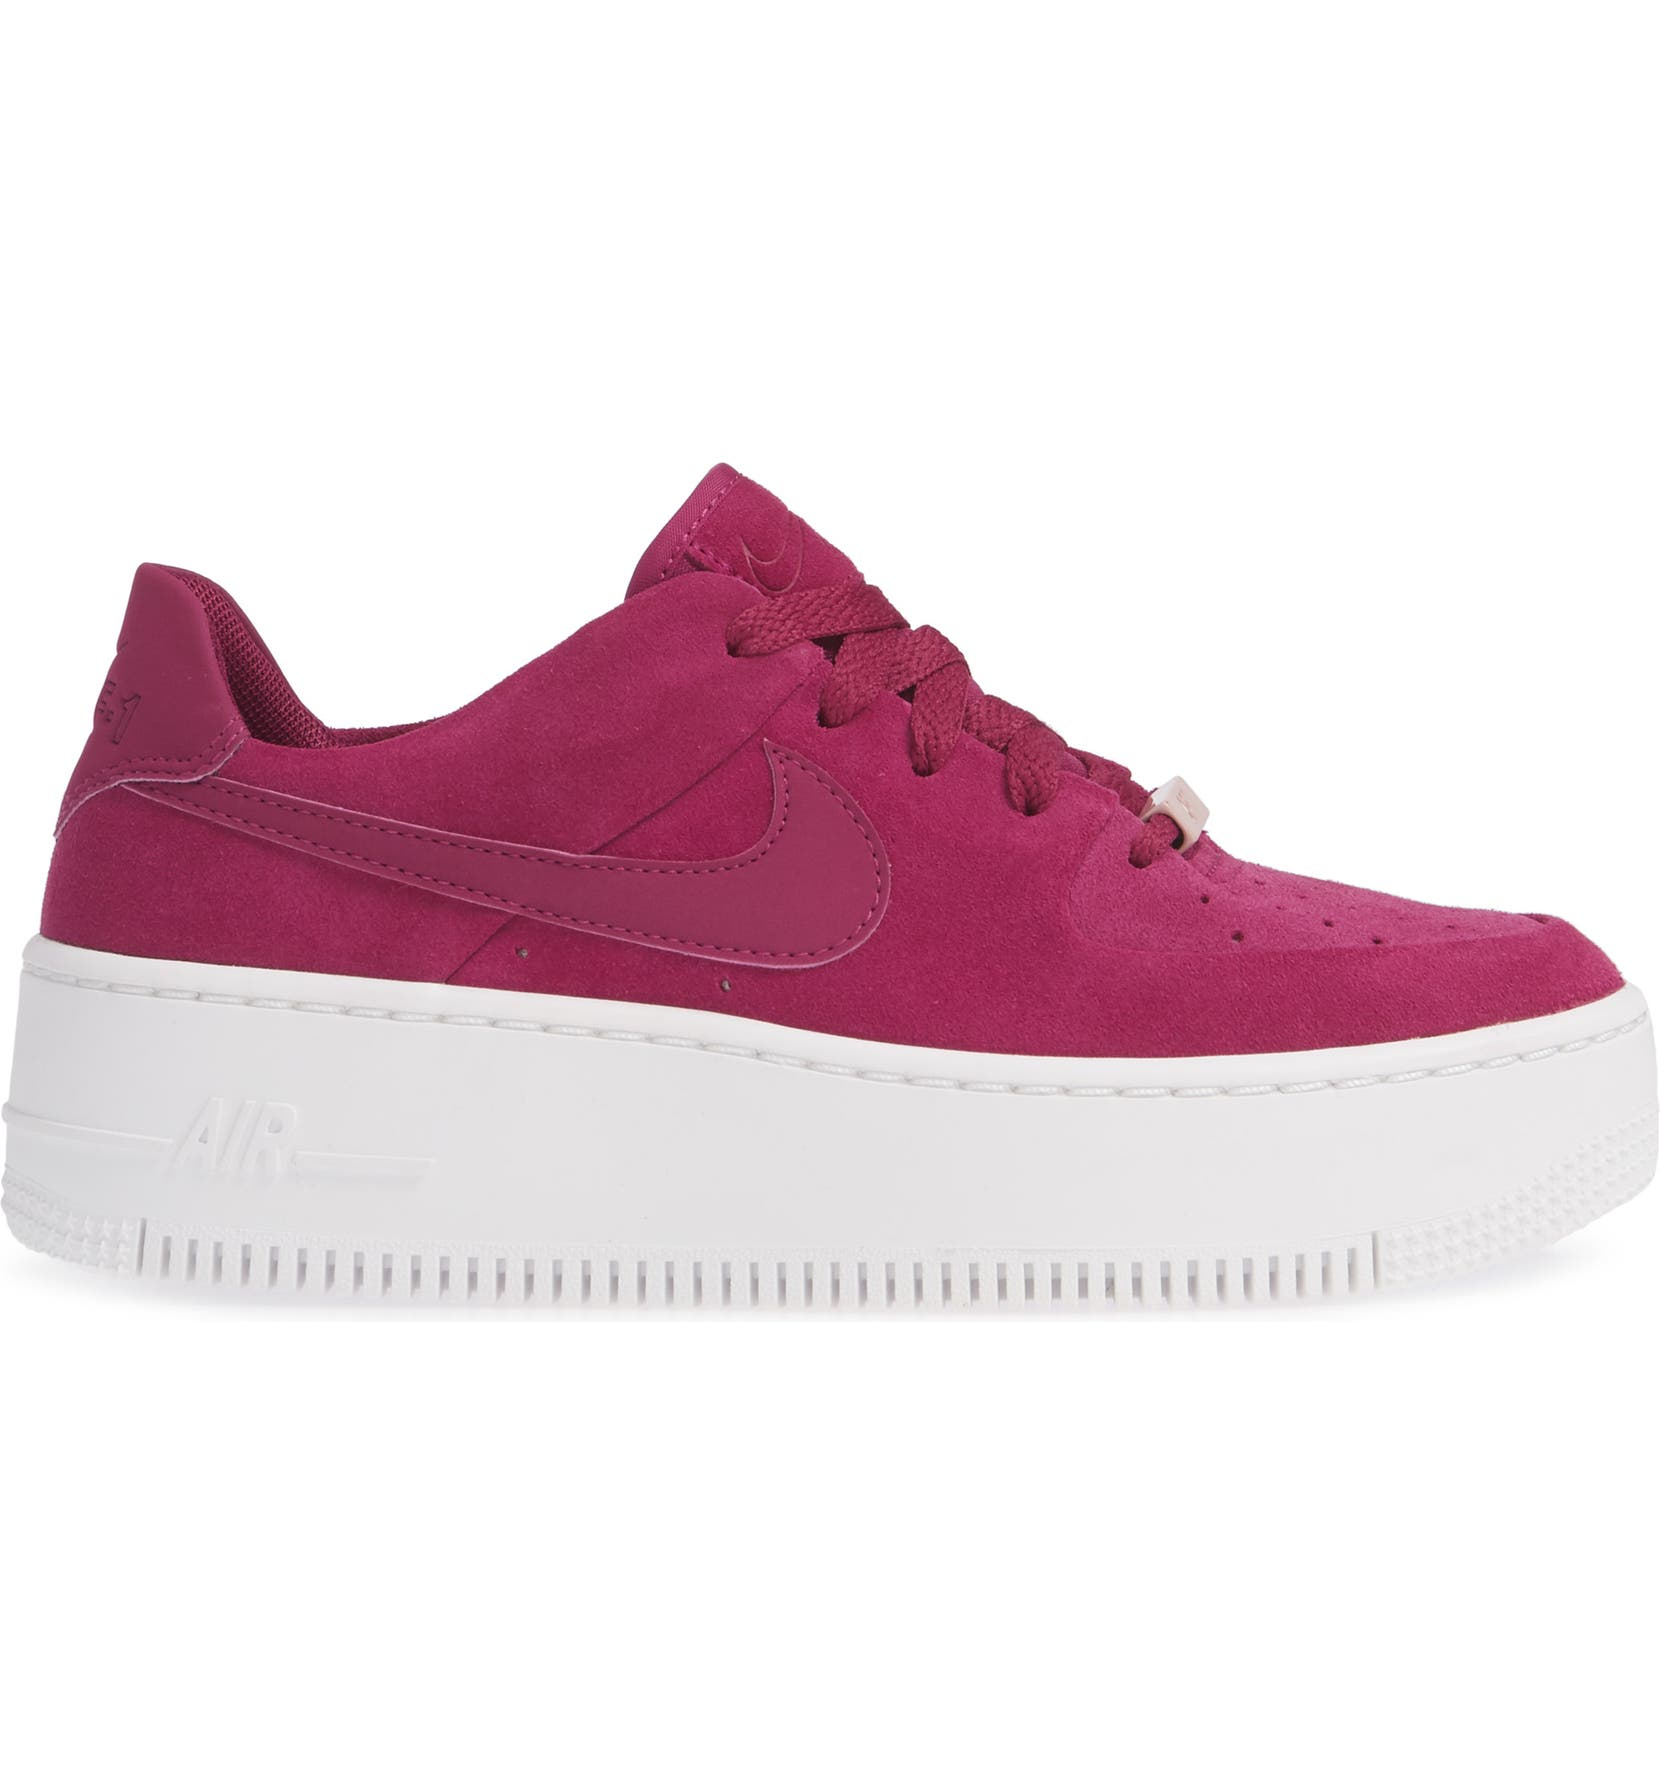 Nike Air Force 1 Sage Low Platform Sneaker (Women)  938f236d4